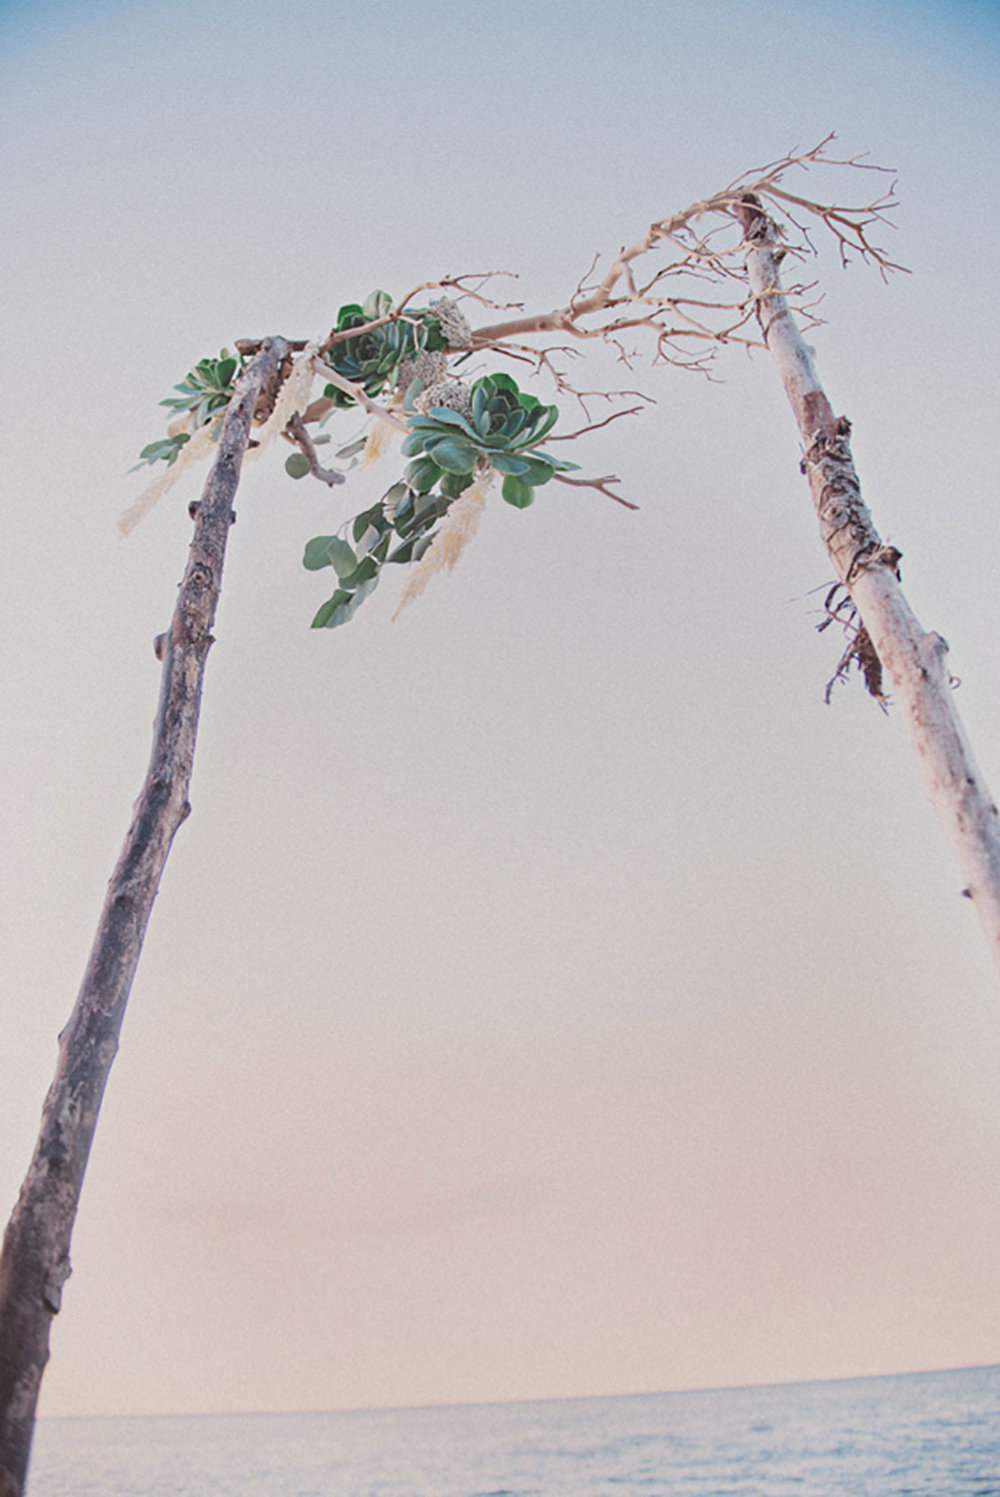 Grimbsy-Beach-Editorial-Vineyard-Bride-photo-by-Destiny-Dawn-Photography-009.JPG